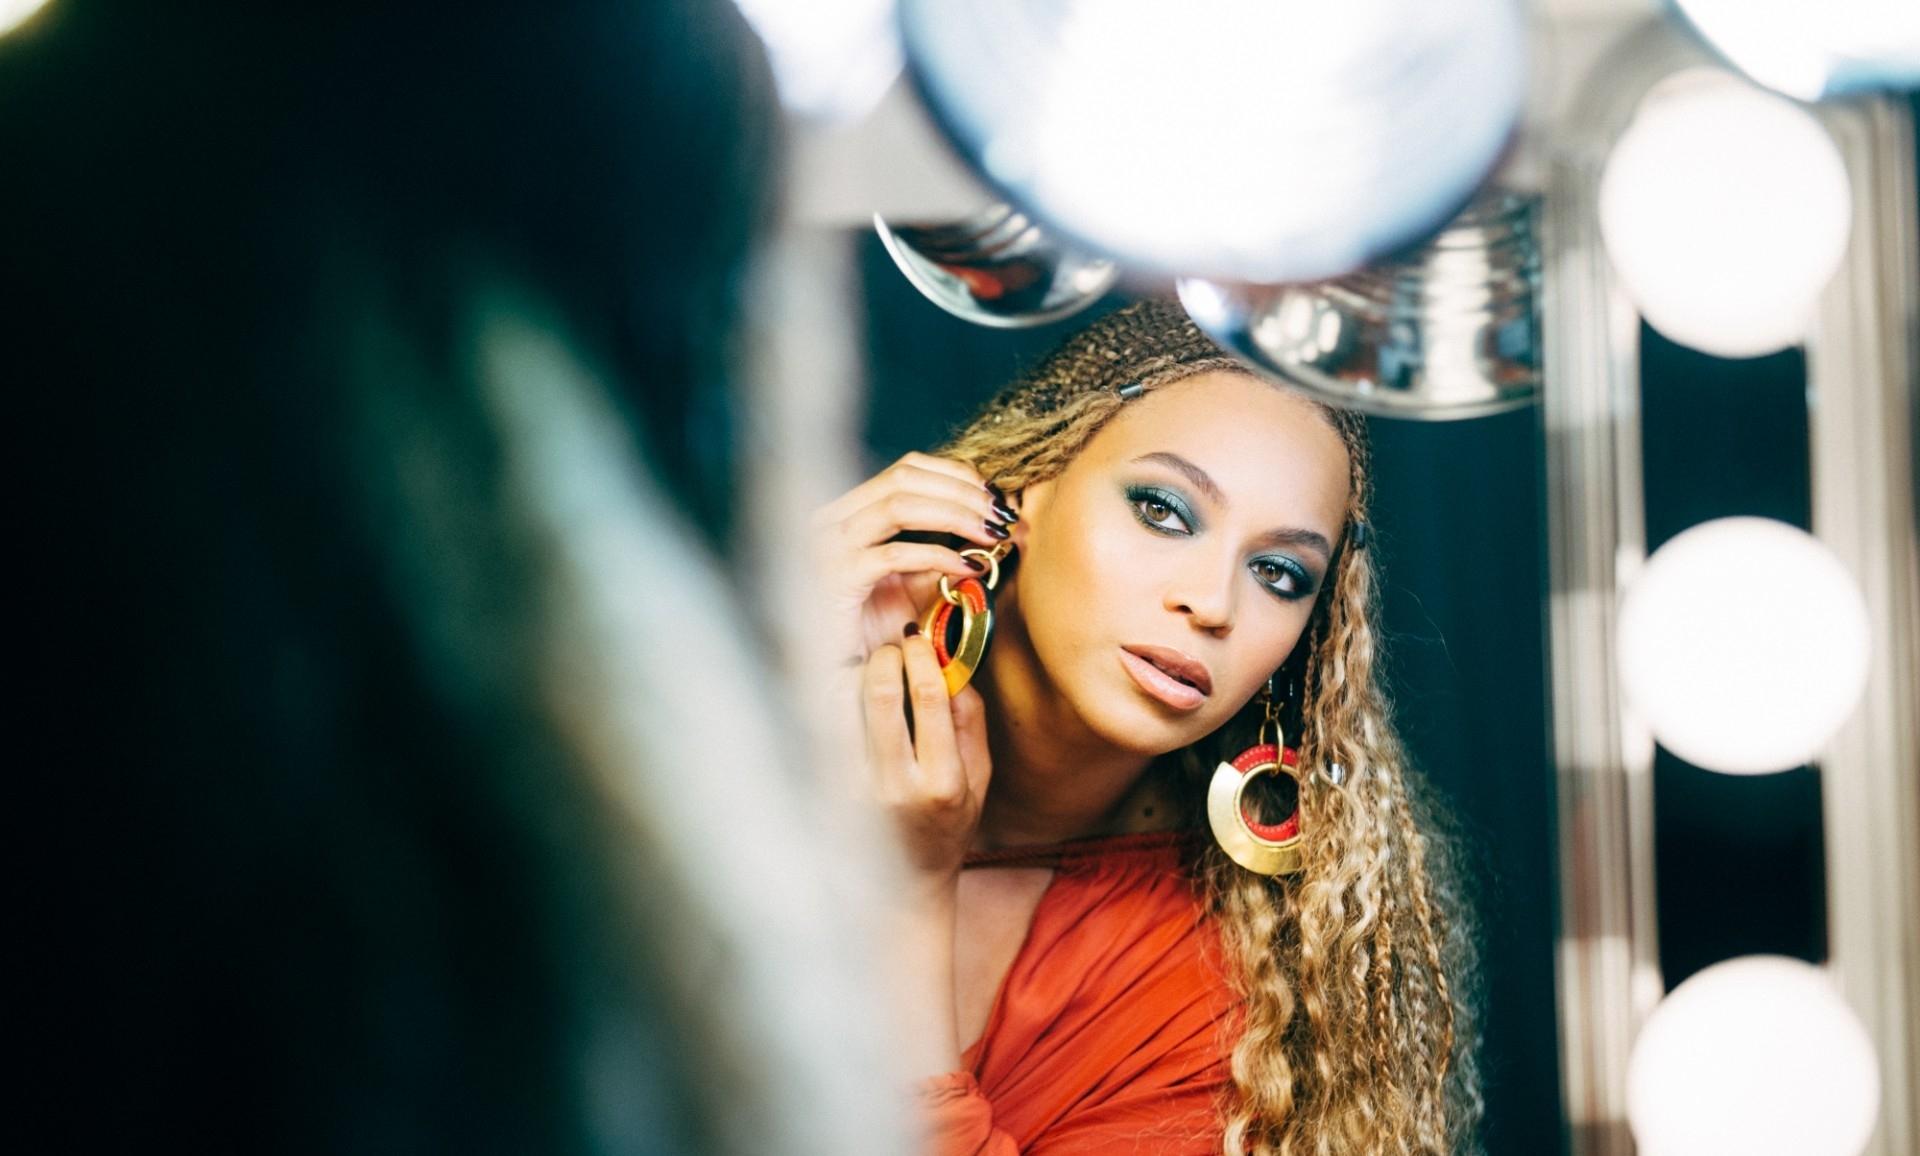 BeyonceCardiff_AW_015.jpg